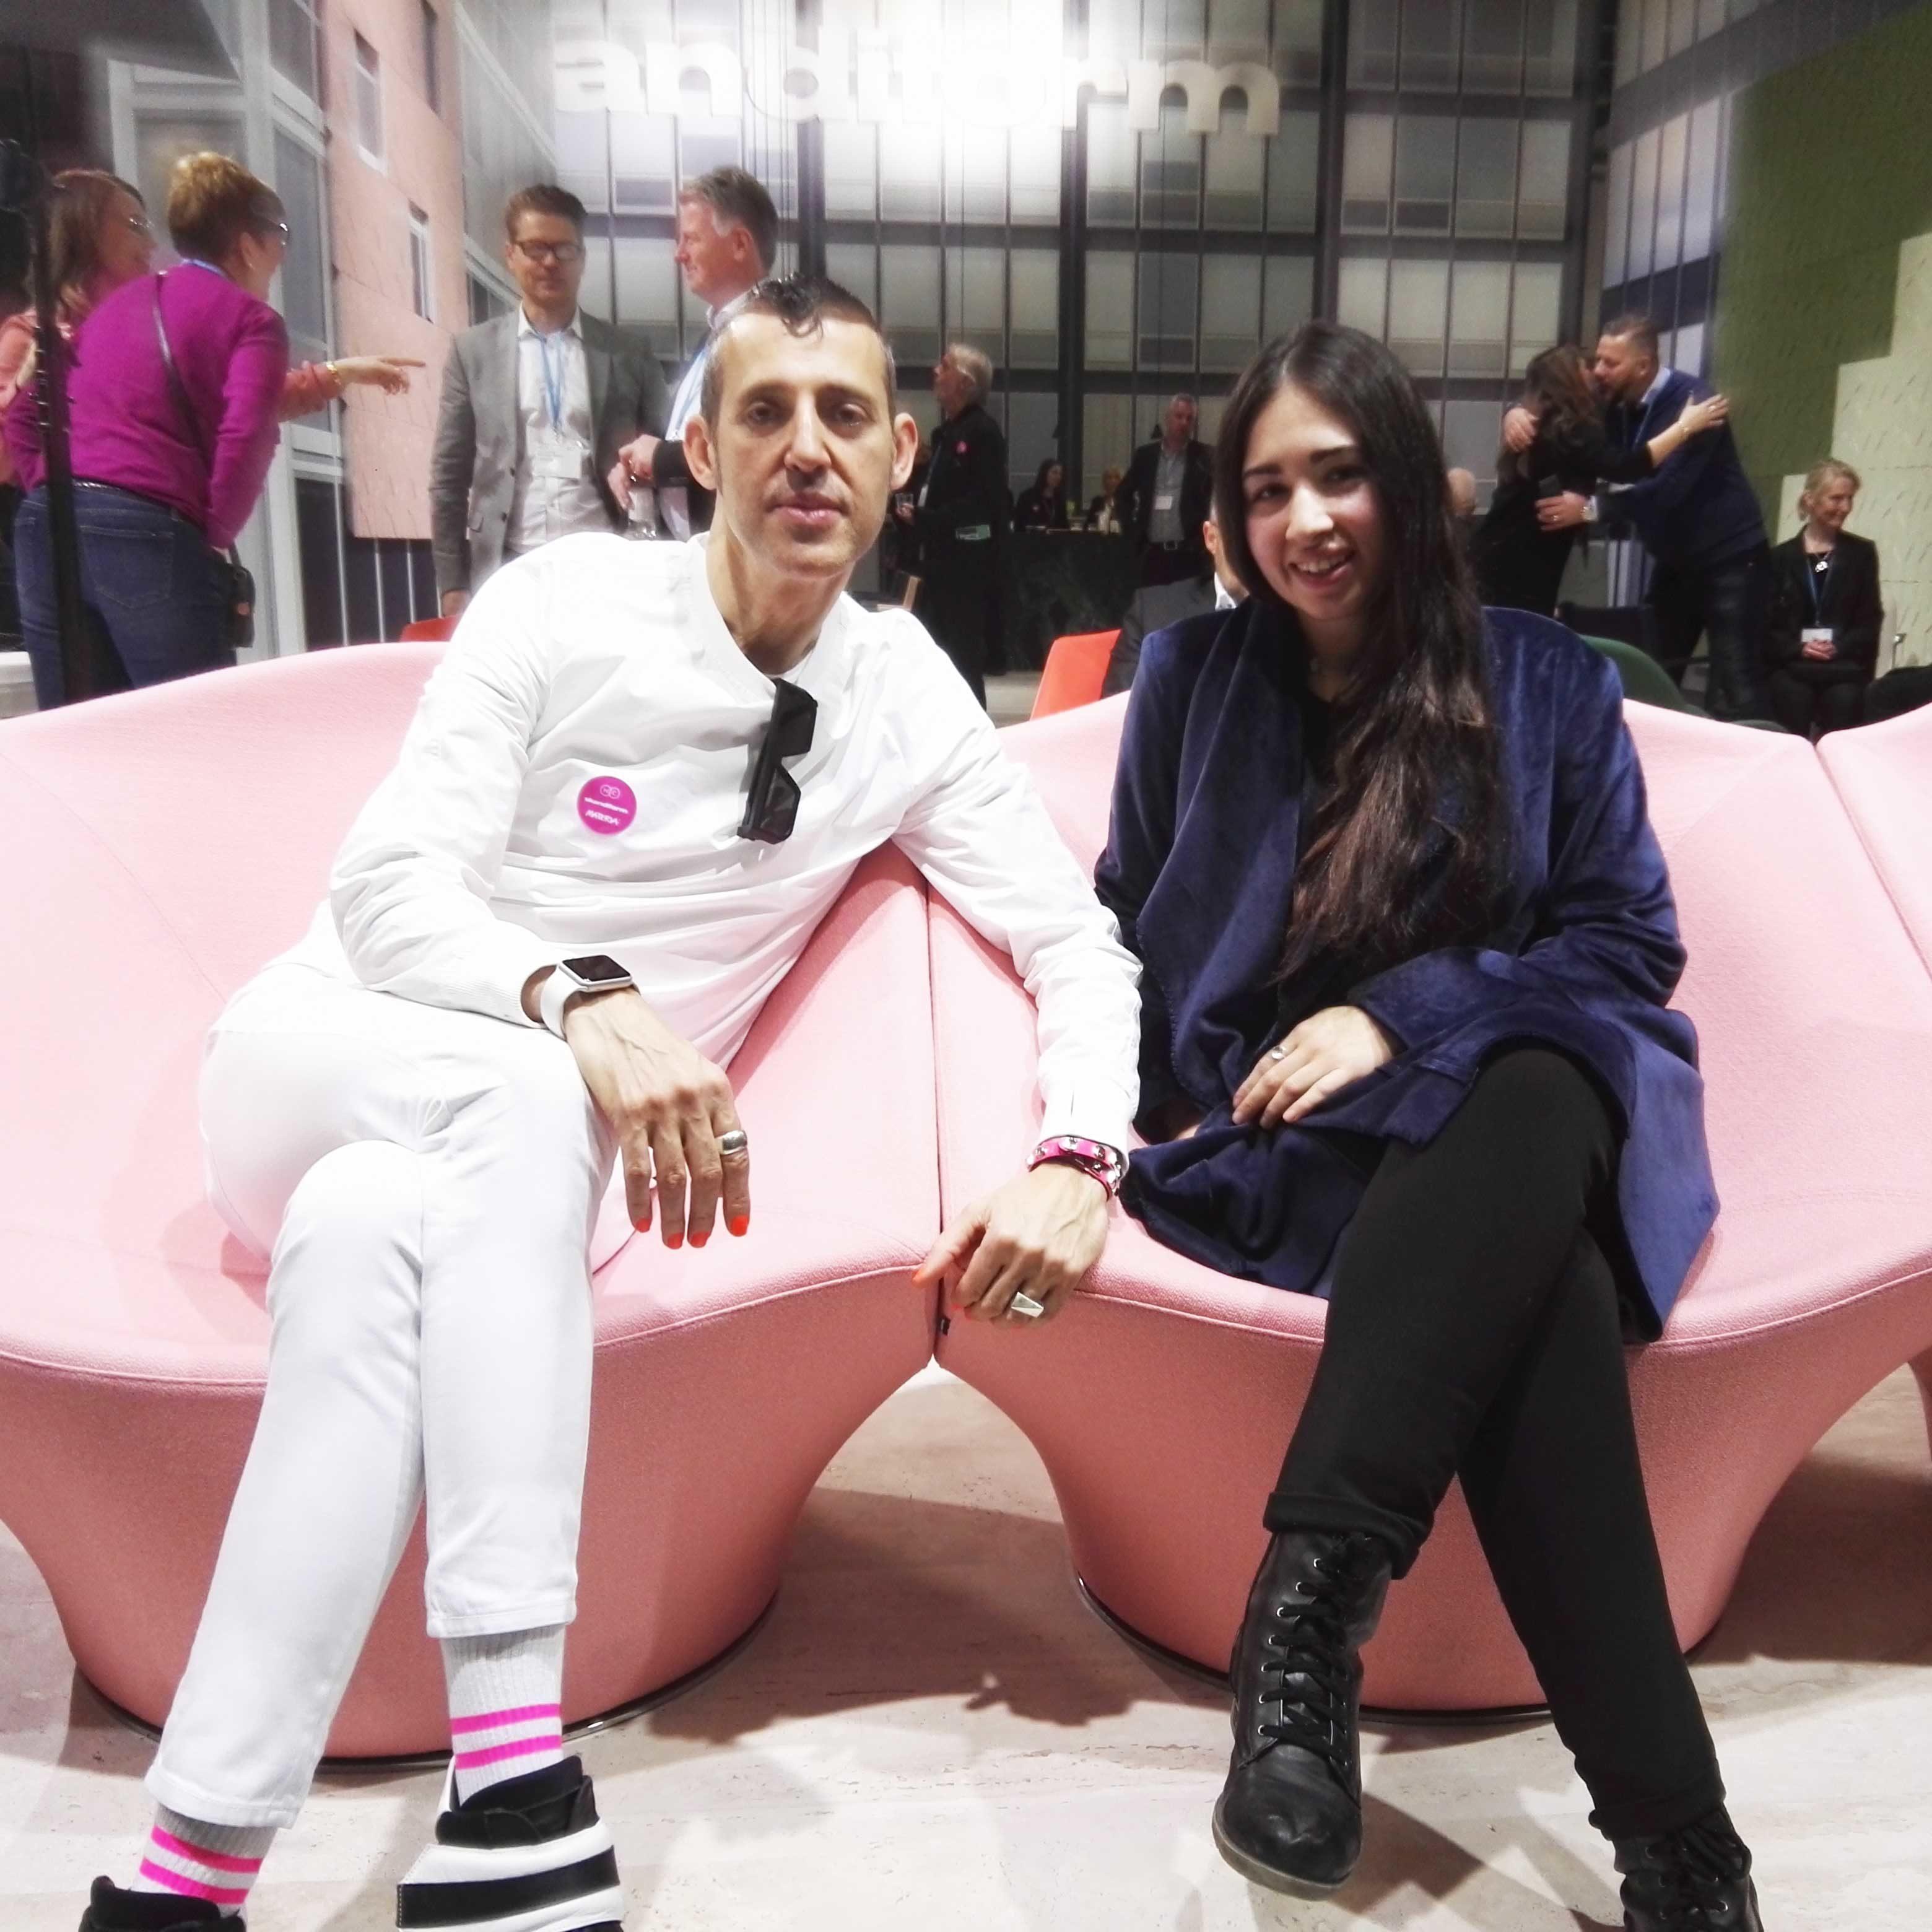 Meeting my designer idol